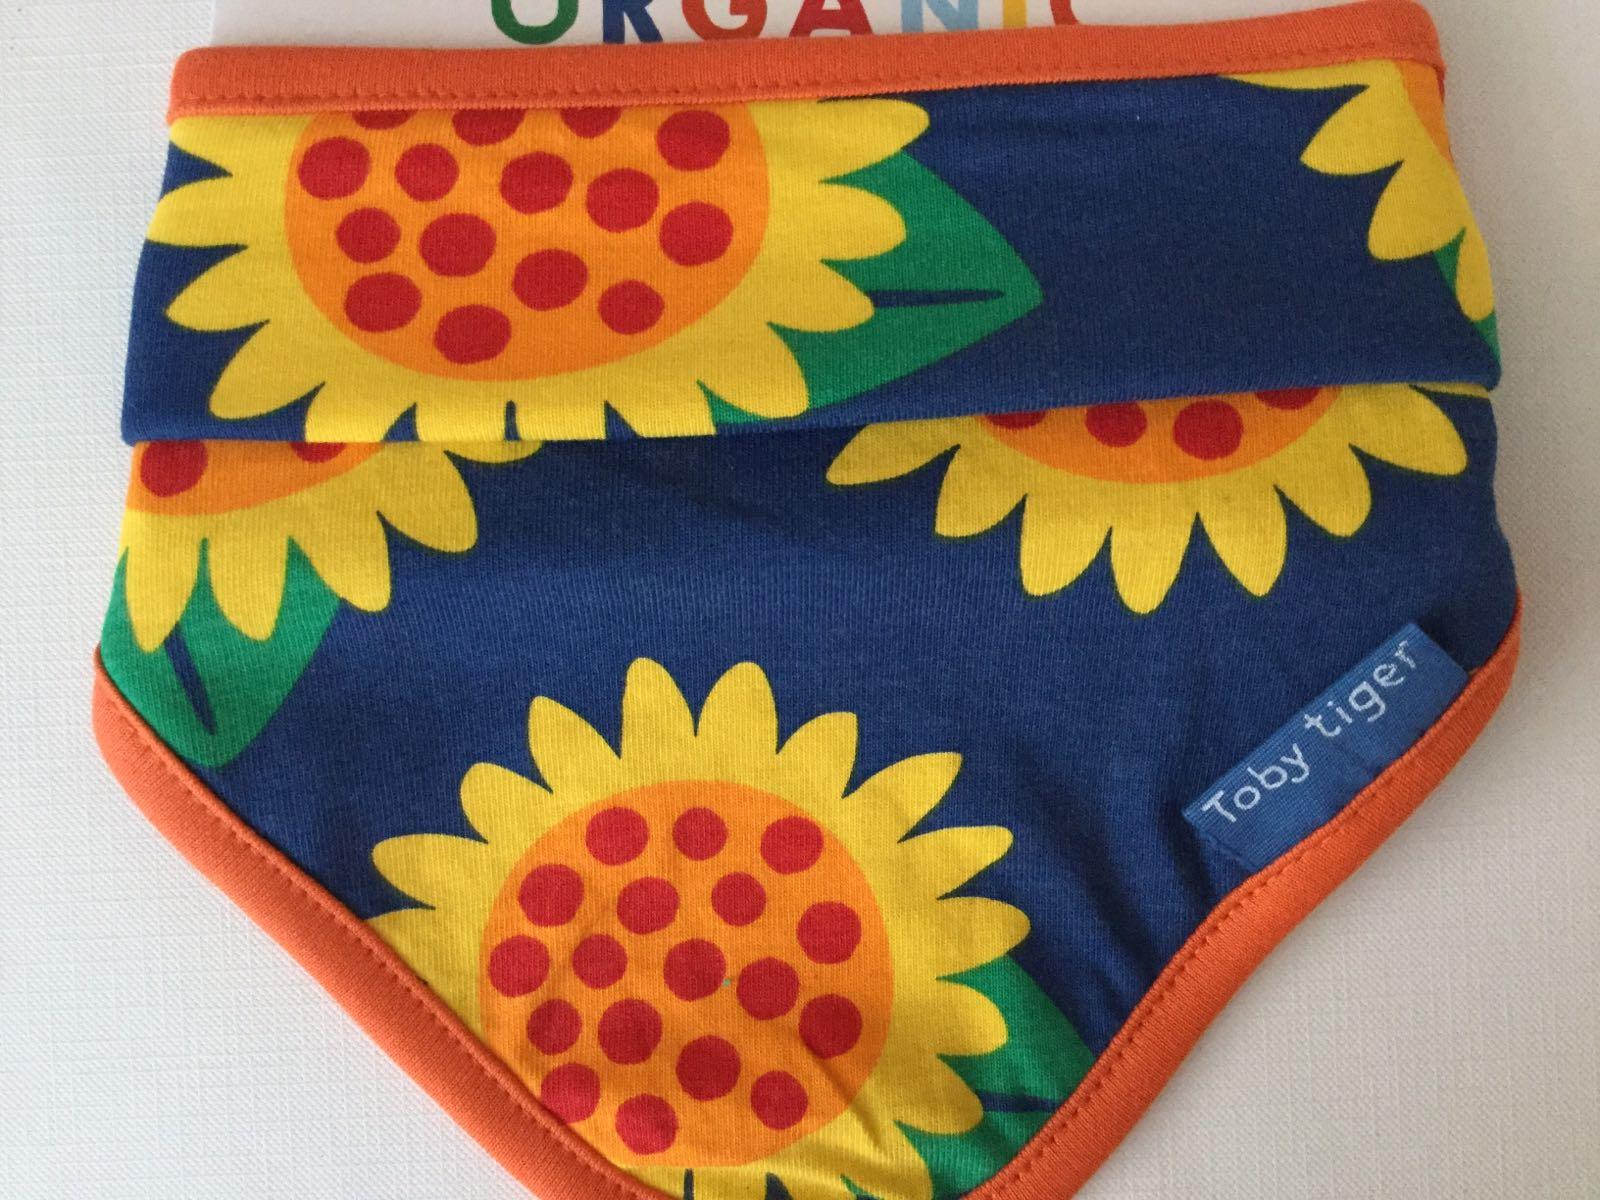 Toby tiger - dribble bib -   Sunflower print